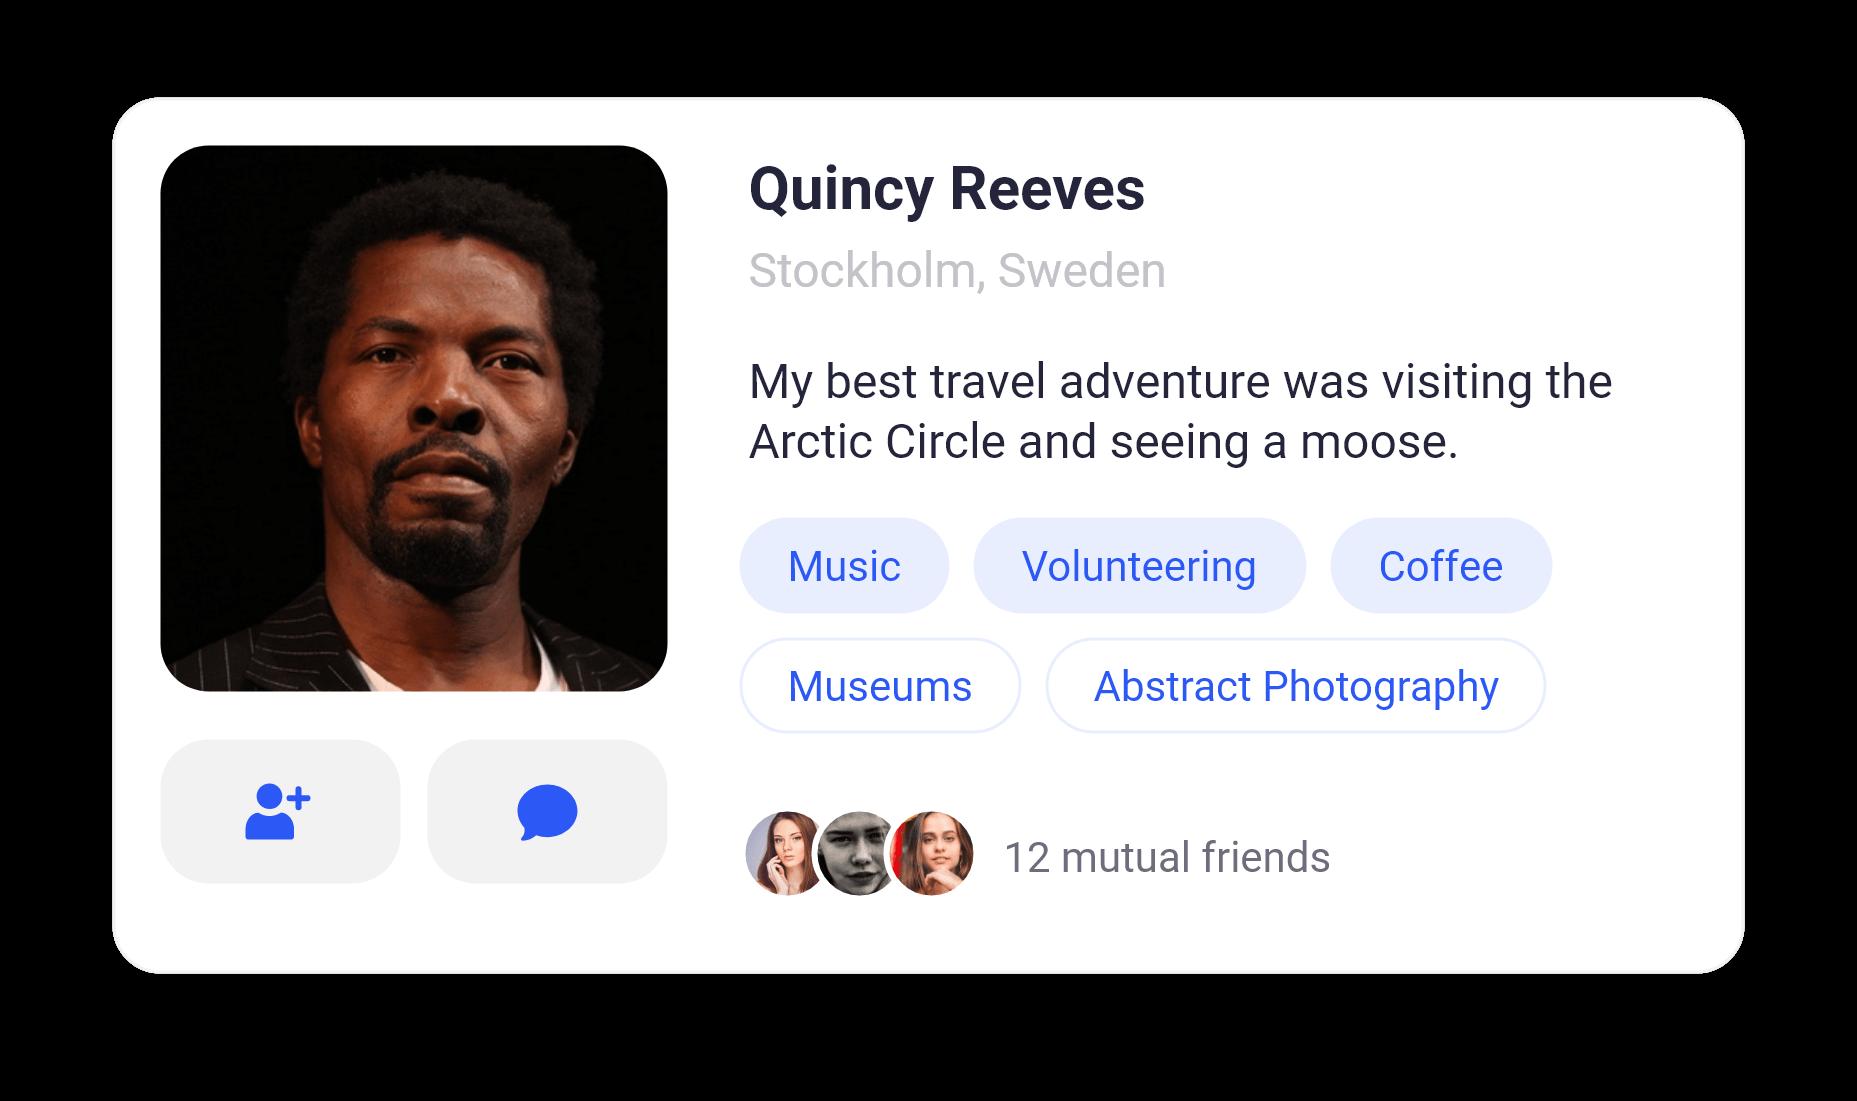 Quincy Reeves card